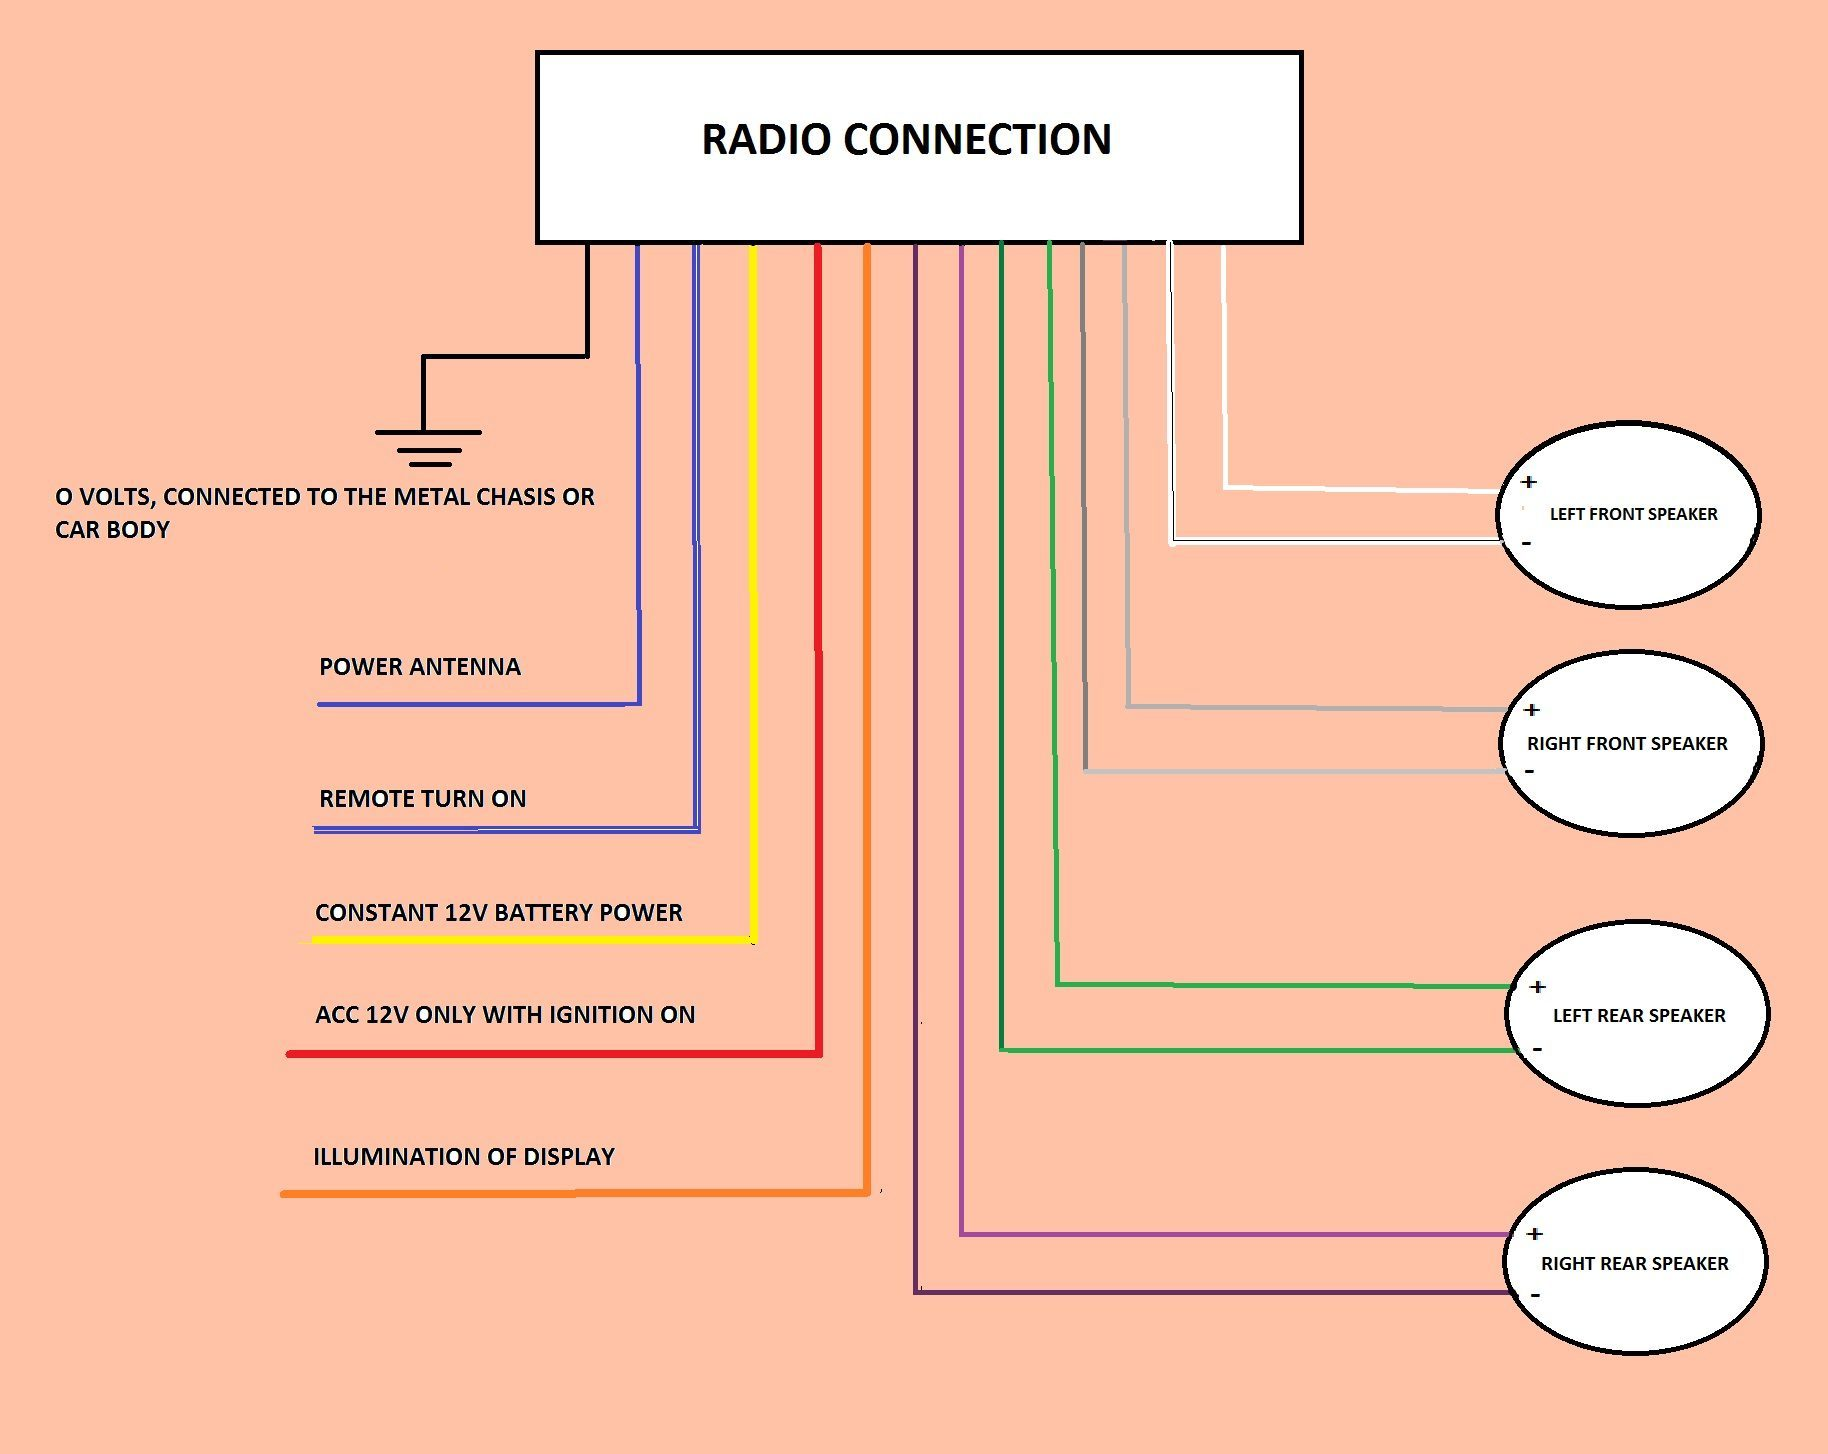 [NRIO_4796]   CAR RADIO [CAR STEREO]-HOW TO INSTALL,REPLACE AND MORE - | Wiring Diagram Radio Car |  | Car check ups